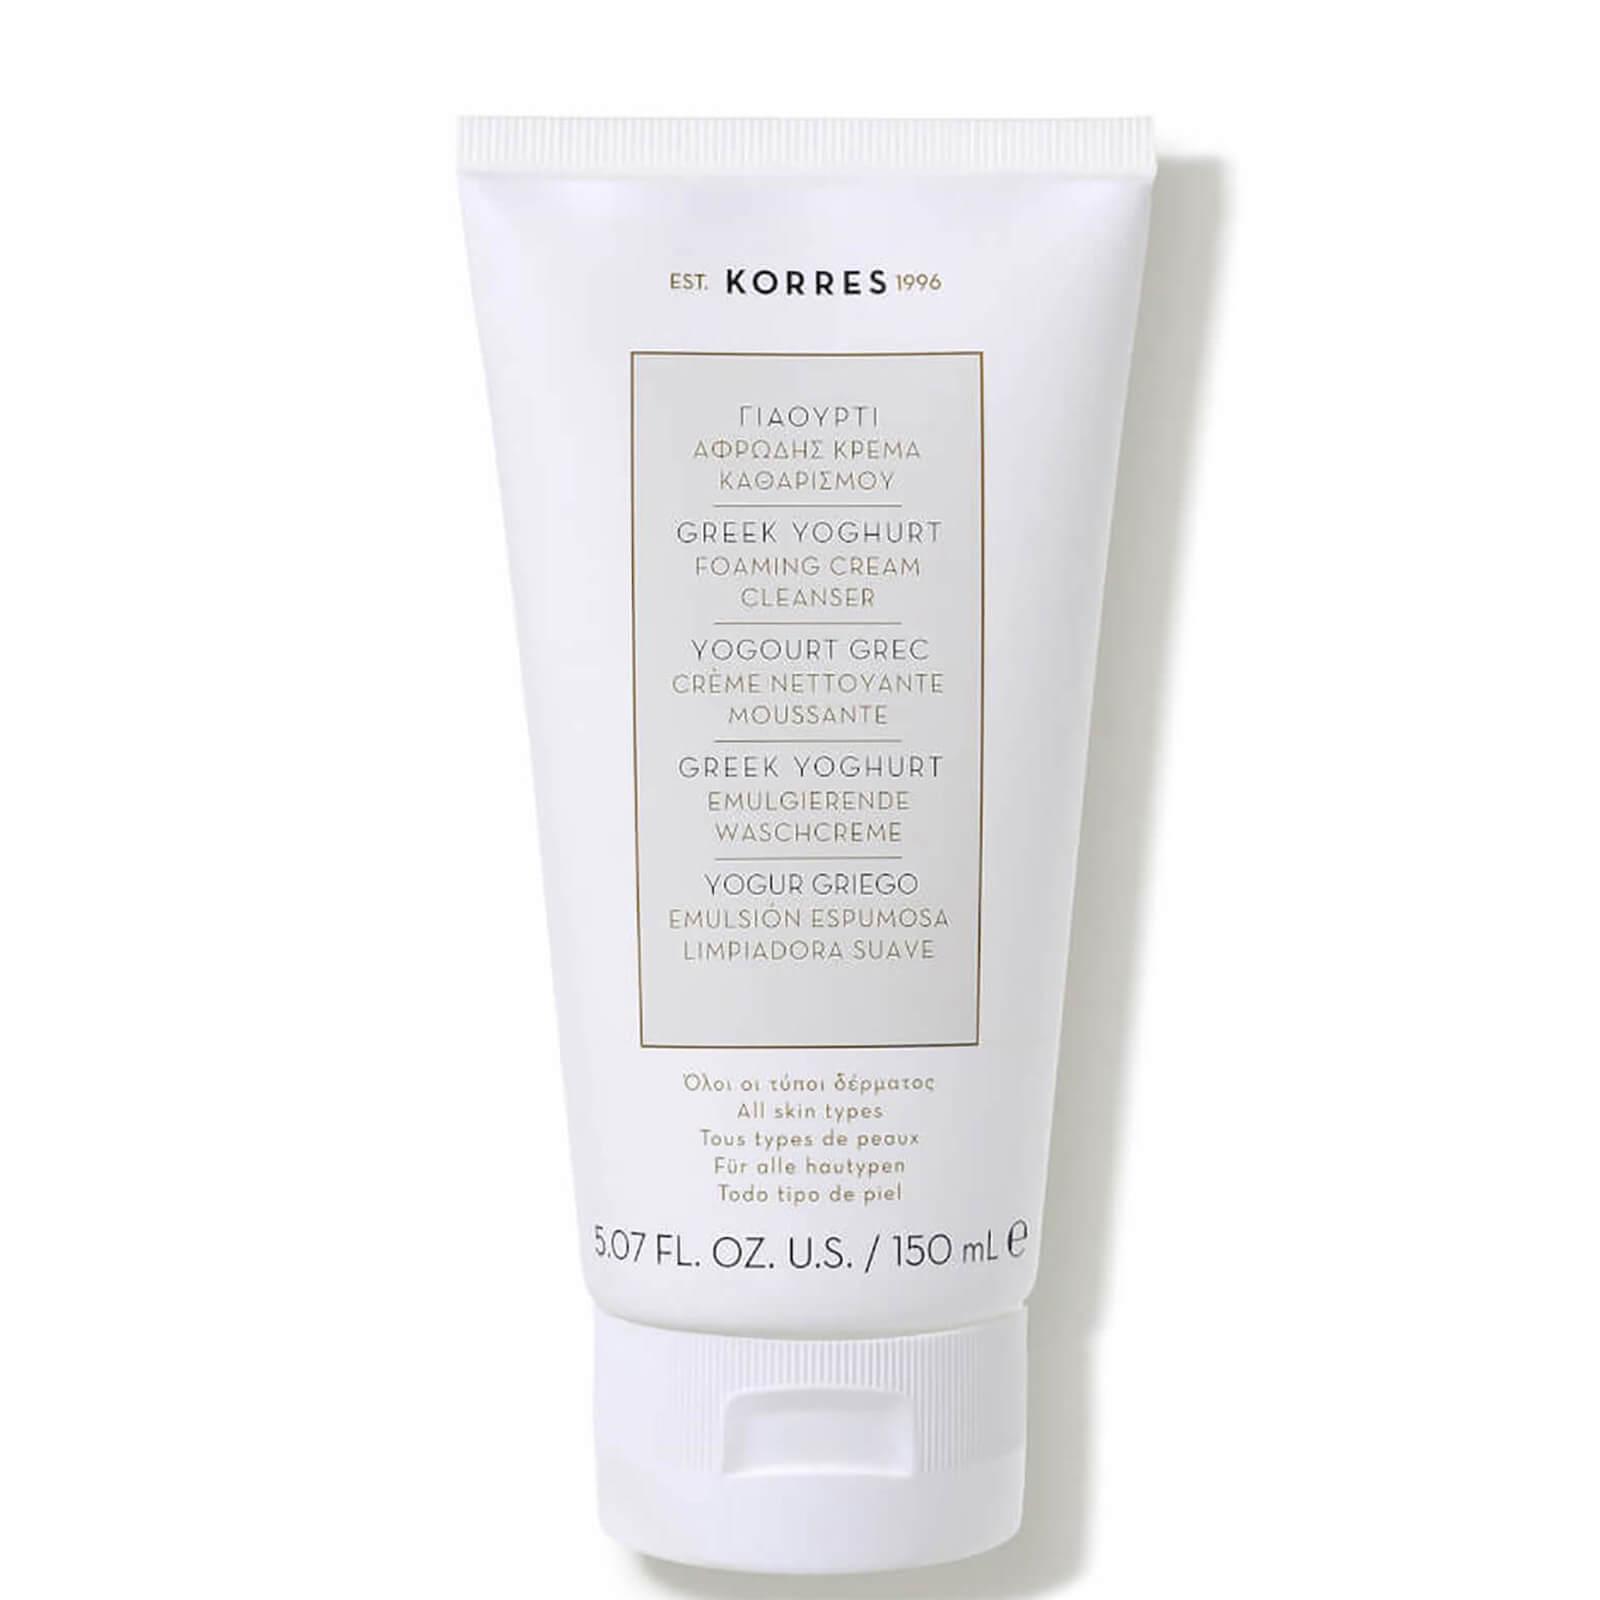 Купить KORRES Greek Yoghurt Foaming Cream Cleanser 150ml